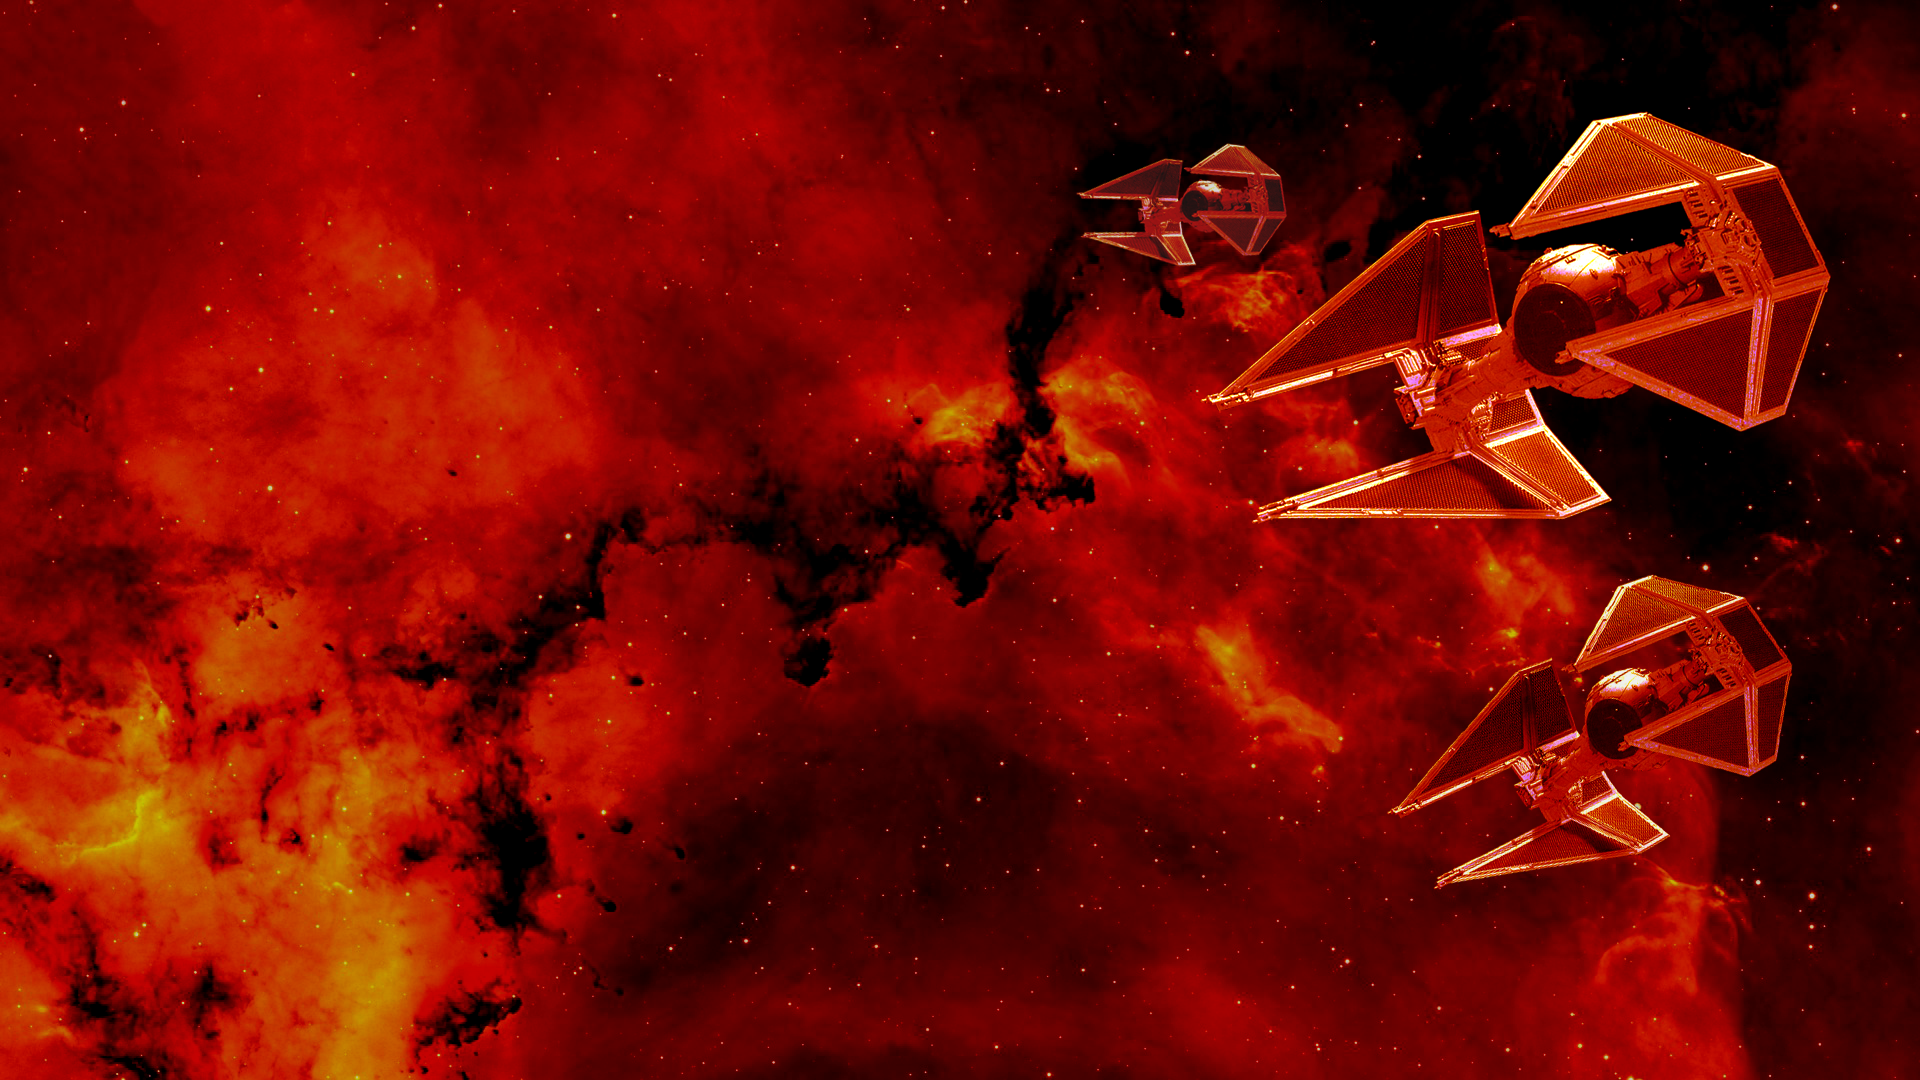 Star Wars HD Wallpaper | Background Image | 1920x1080 | ID ...